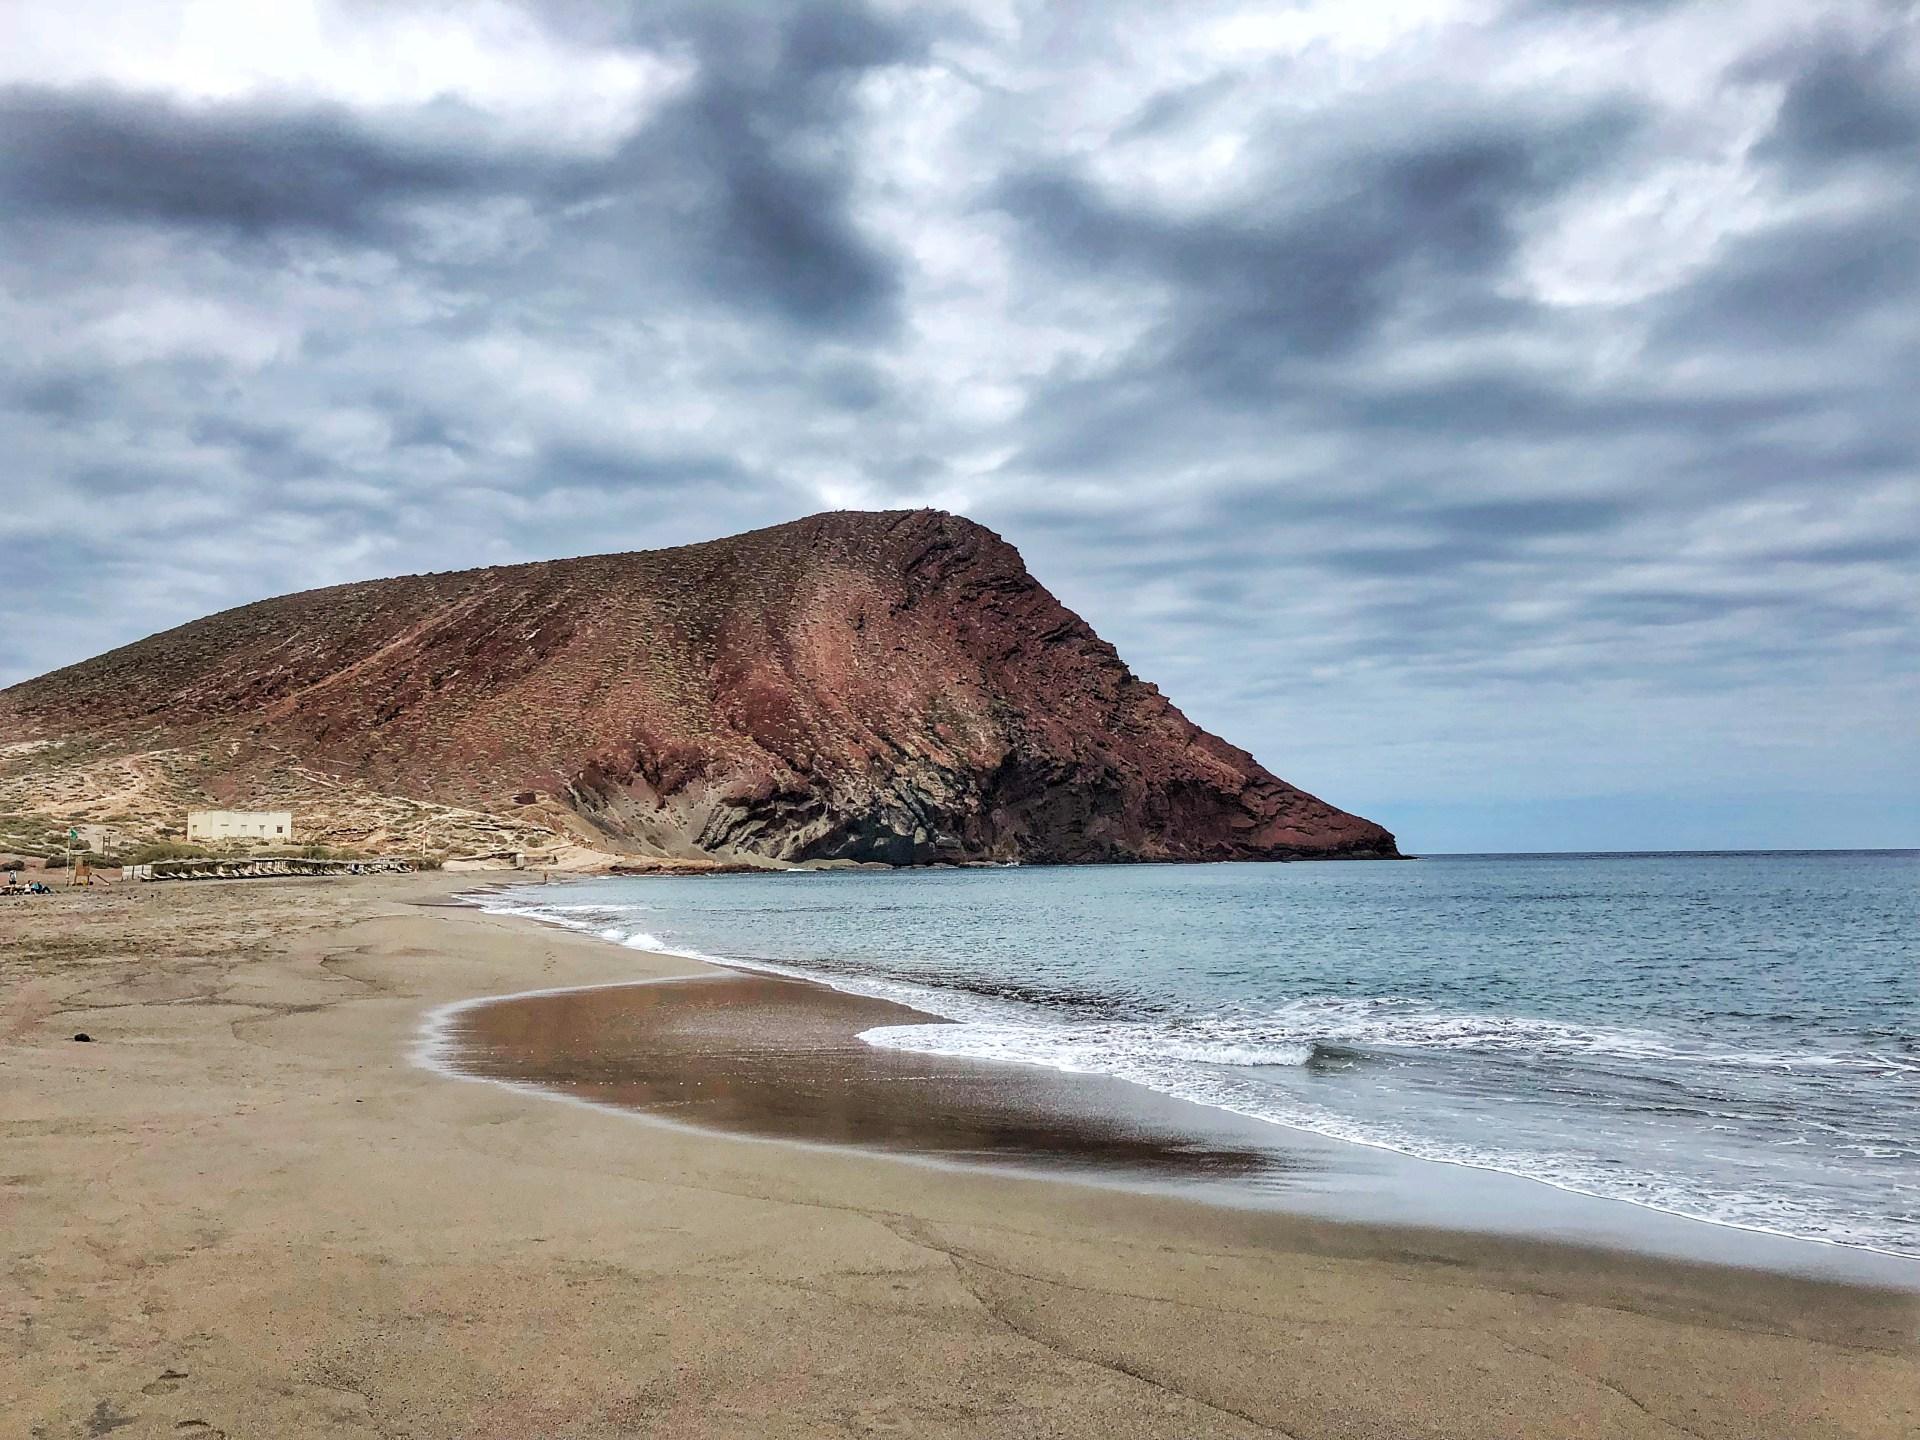 What to do in Tenerife (even if it rains) - Cosa fare a Tenerife (Anche se piove!)